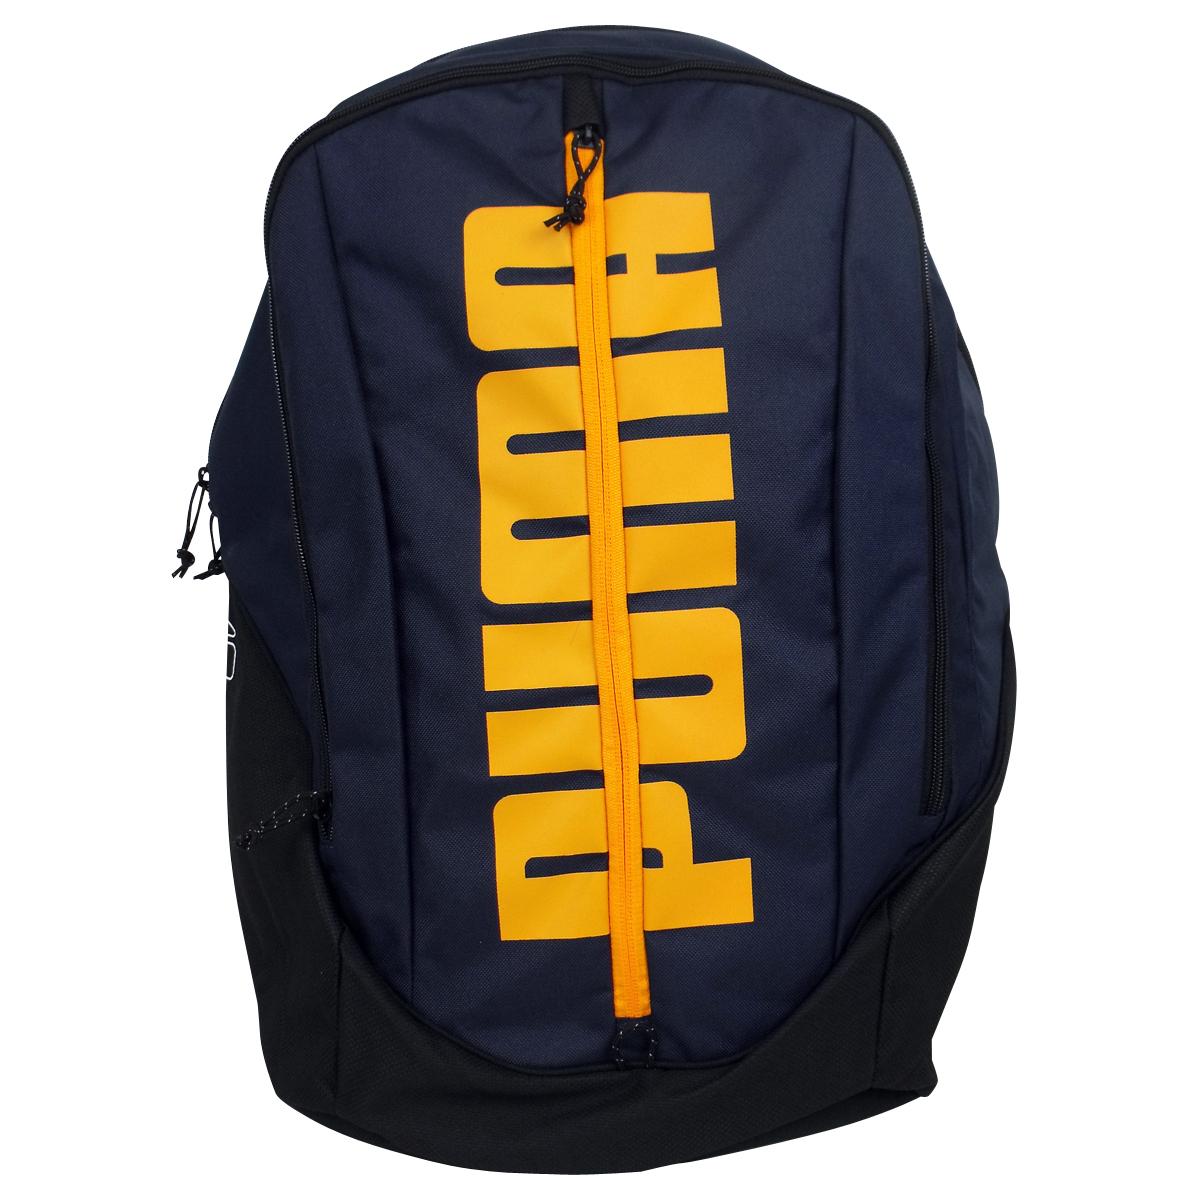 Bags for school amazon - Details About Puma Schulrucksack Jungen Herren Sportrucksack Schwarz